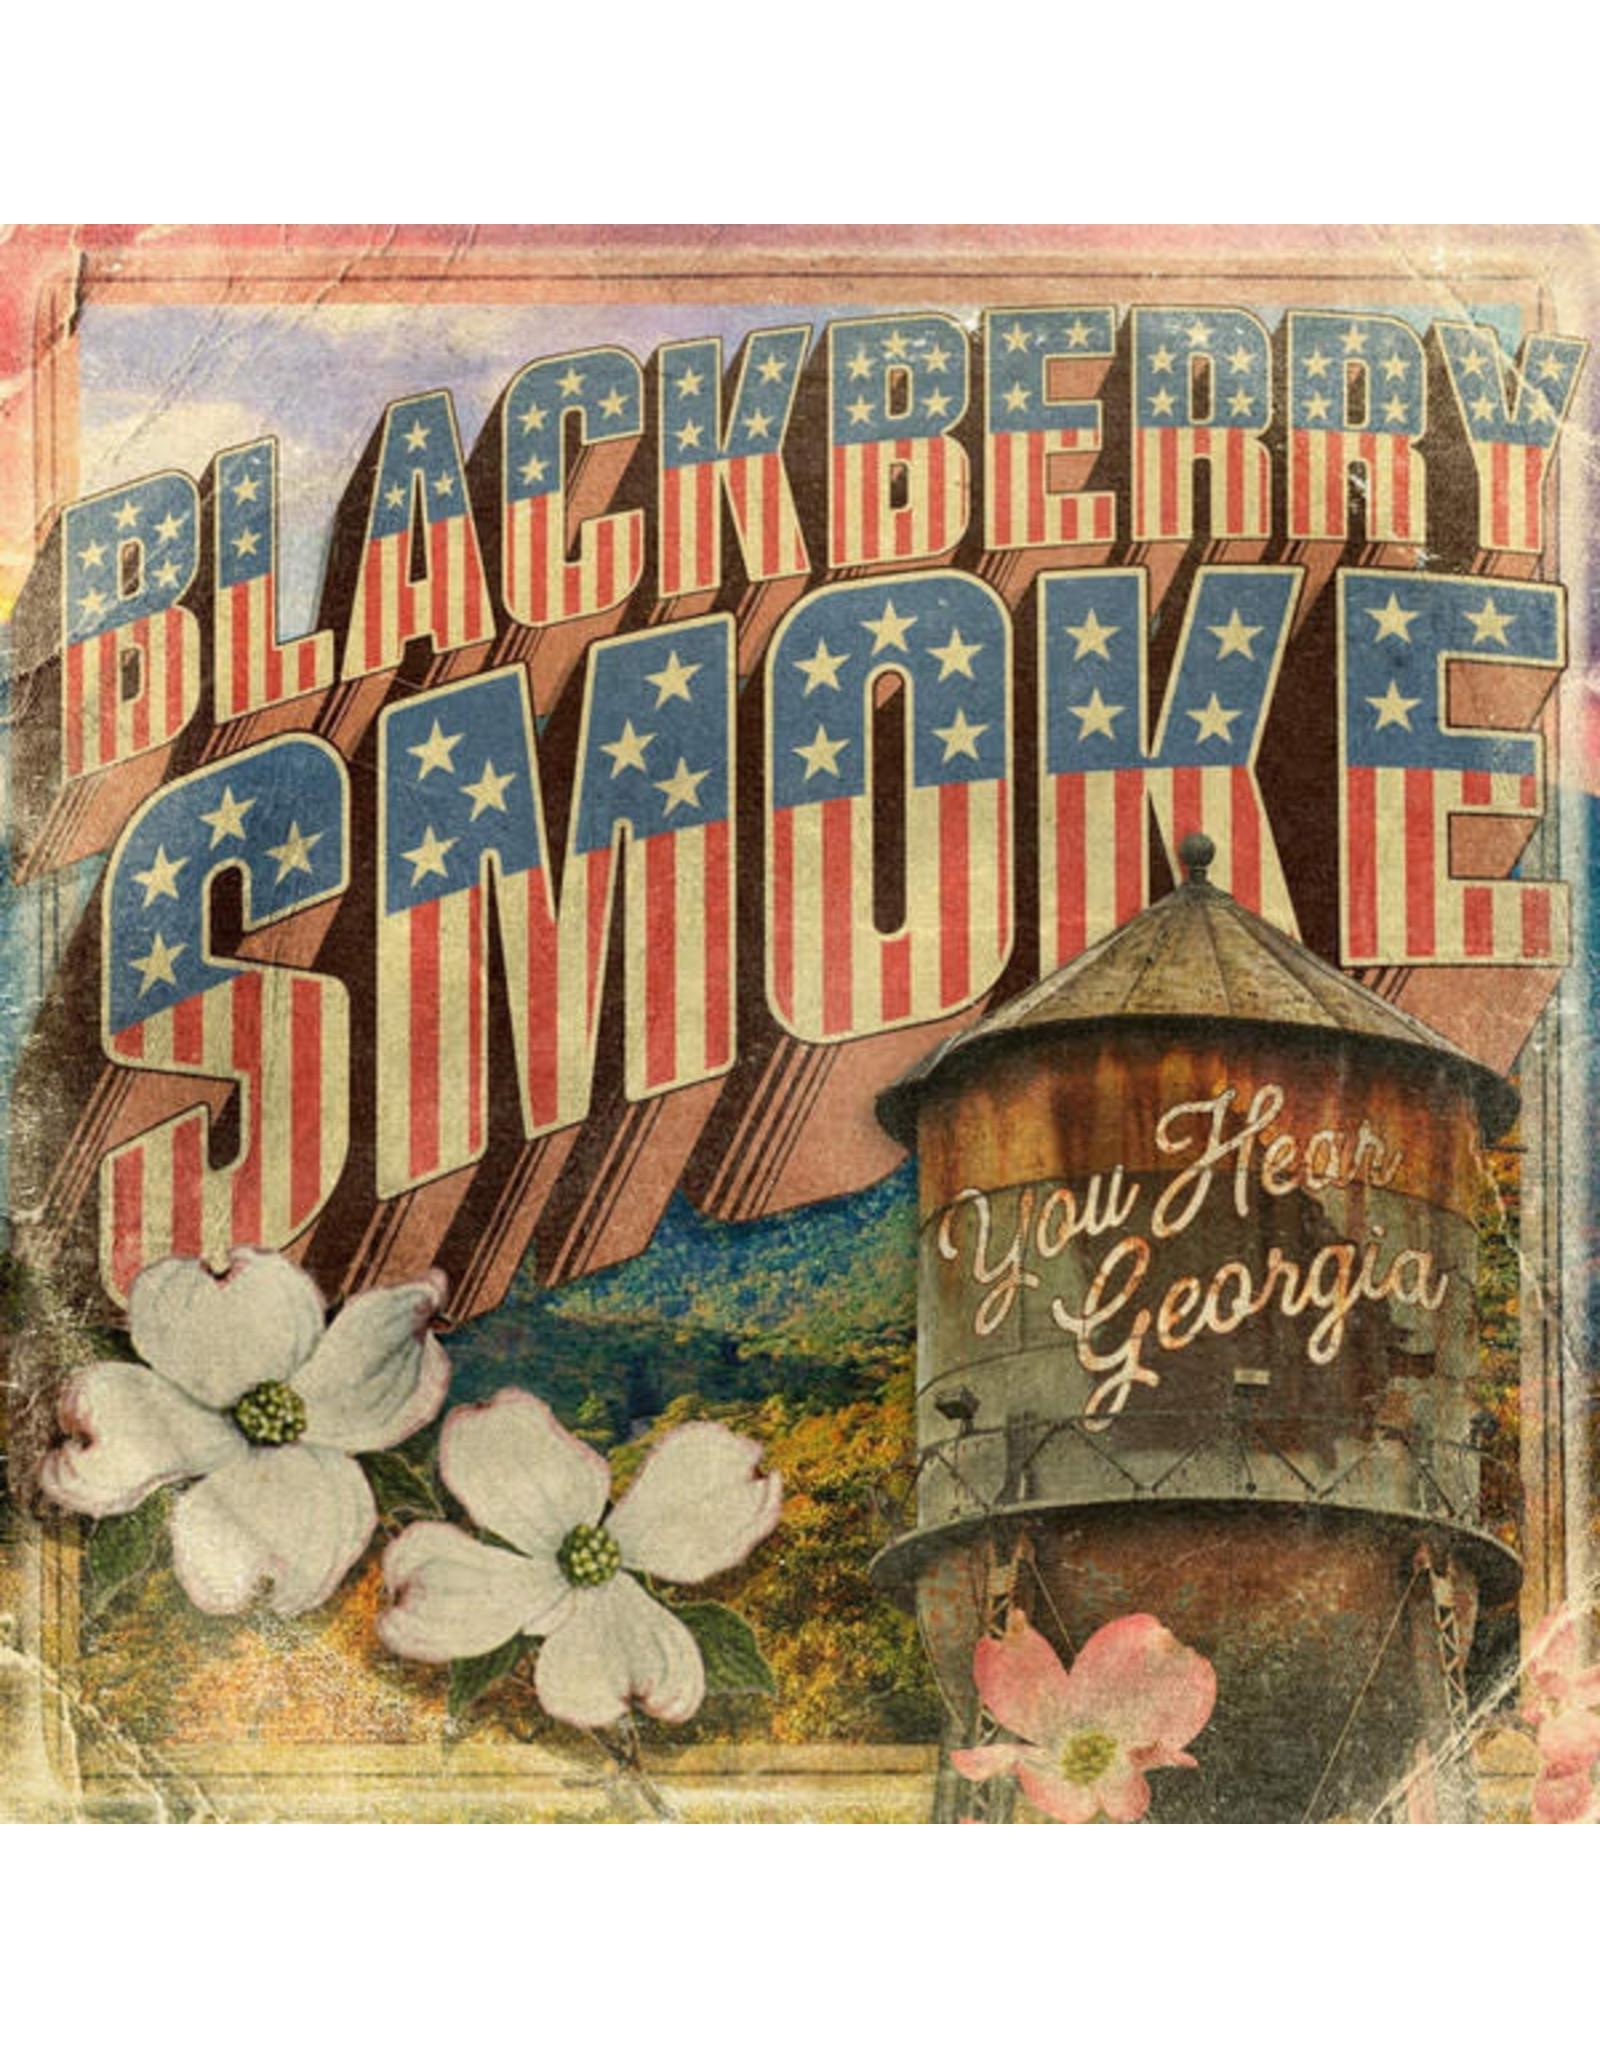 Blackberry Smoke - You Hear Georgia 2LP